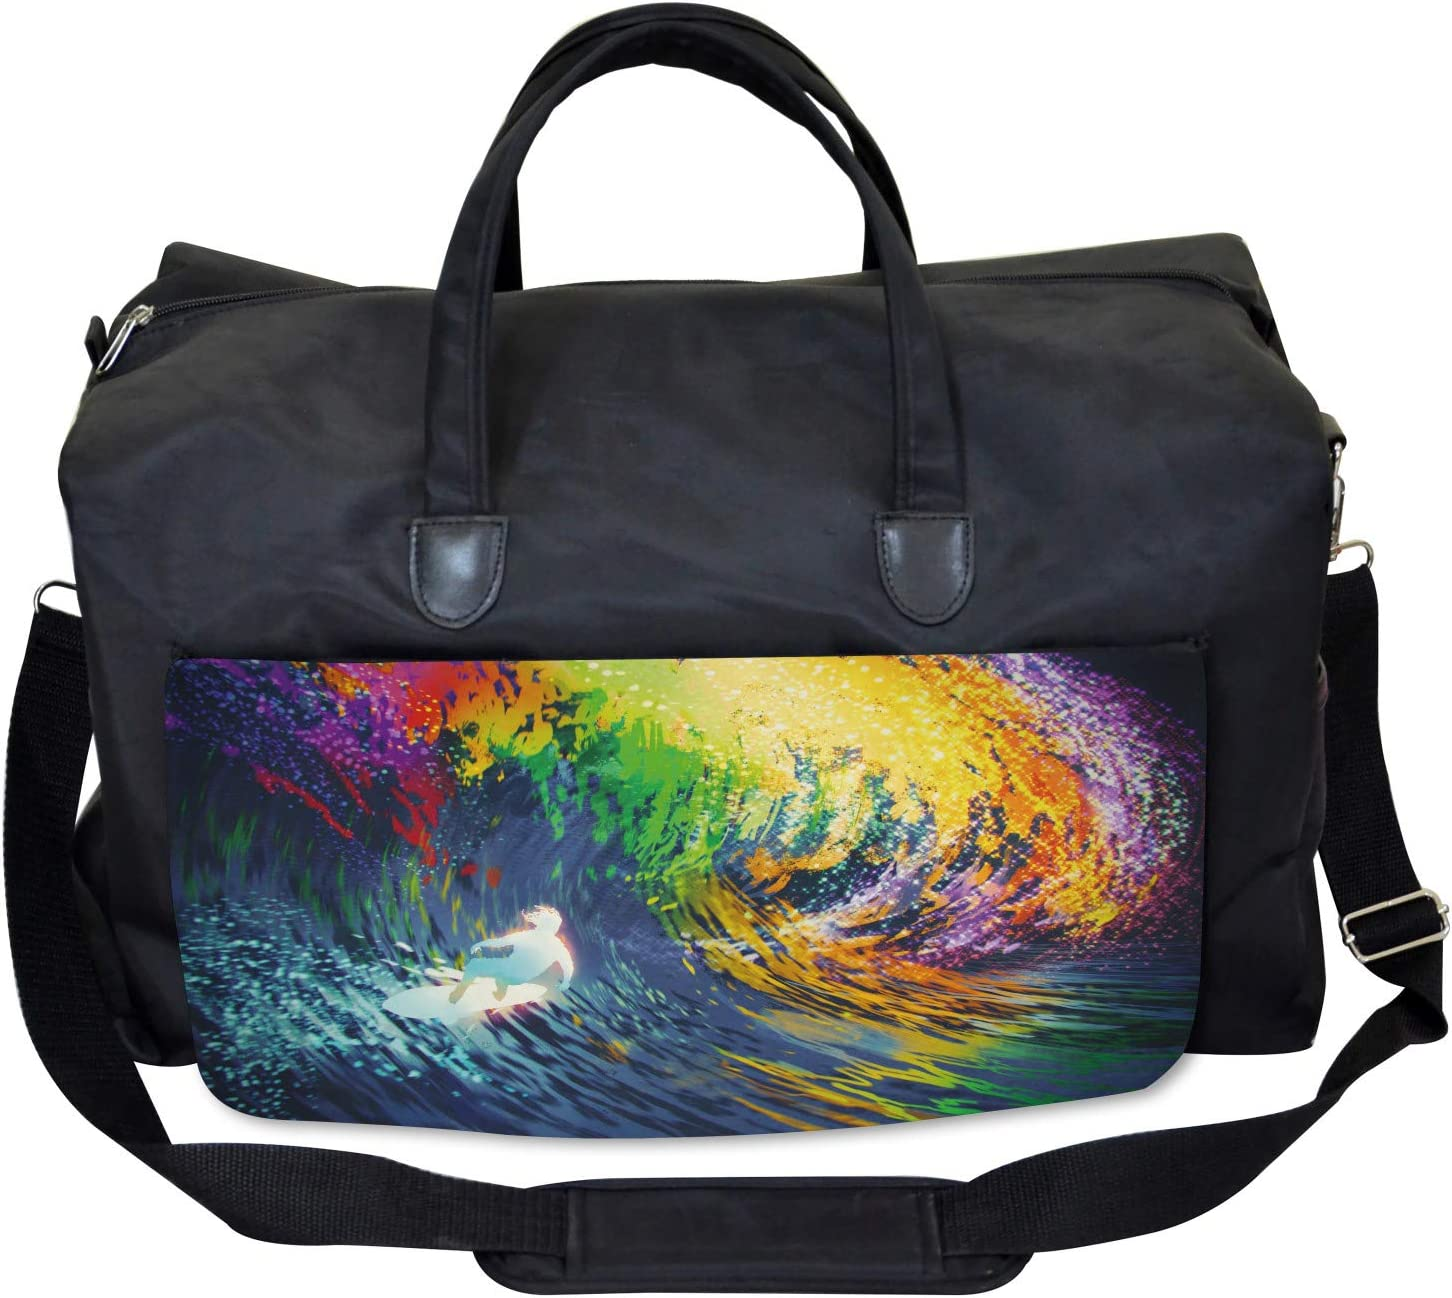 Exotic Surfer on Waves Large Weekender Carry-on Ambesonne Ocean Gym Bag